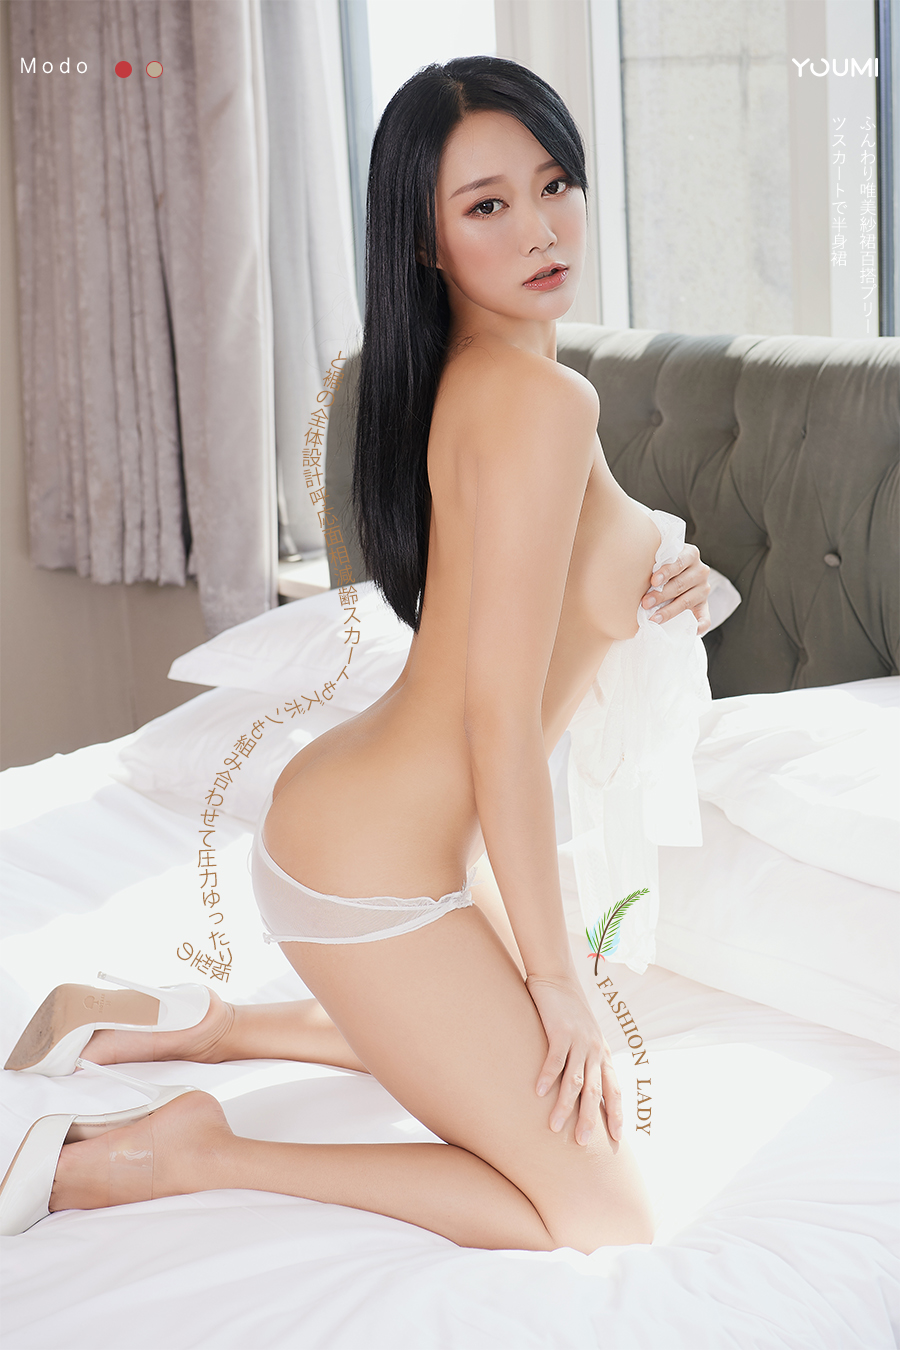 [YouMi尤蜜]2019.10.11 妩媚娇娘 何嘉颖[/39MB]